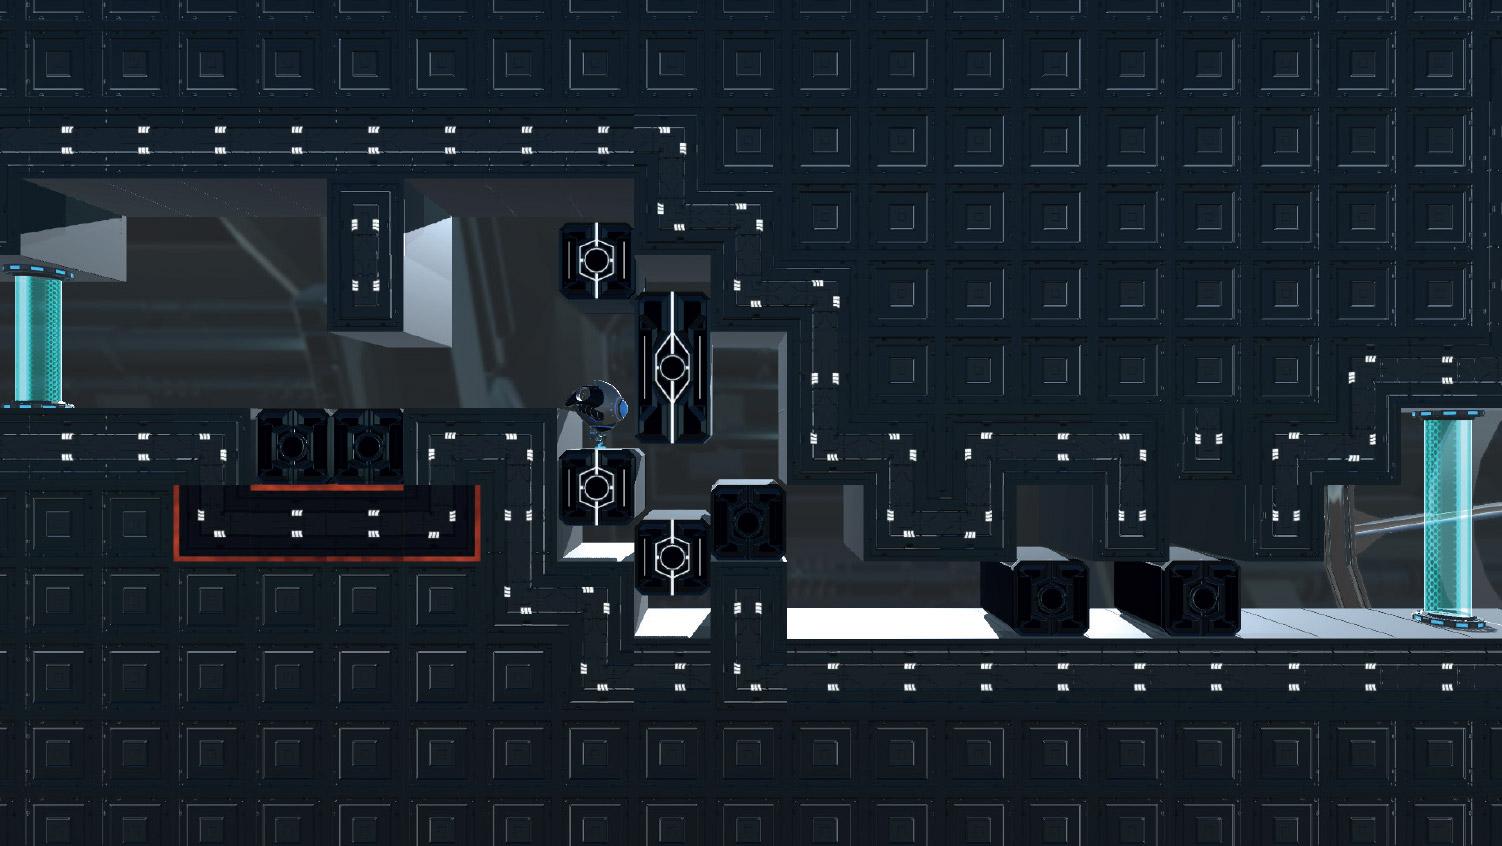 jeu vidéo steelheart parasite